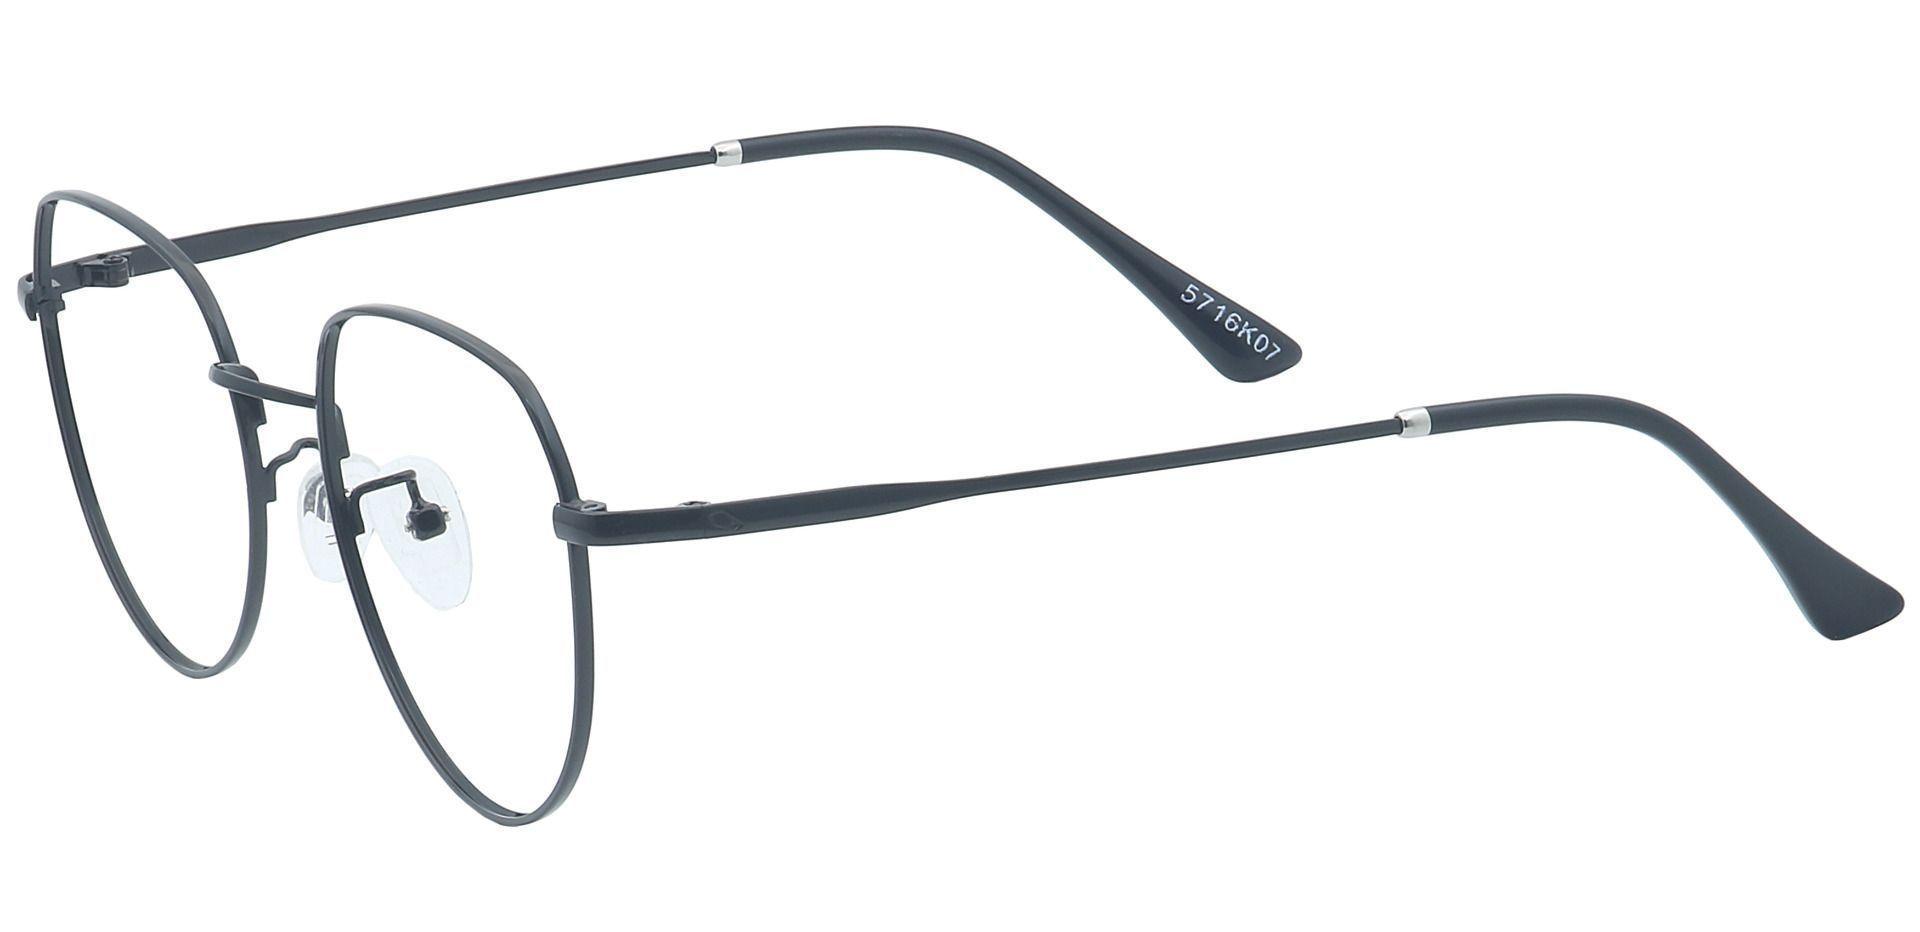 Maren Round Prescription Glasses - Black